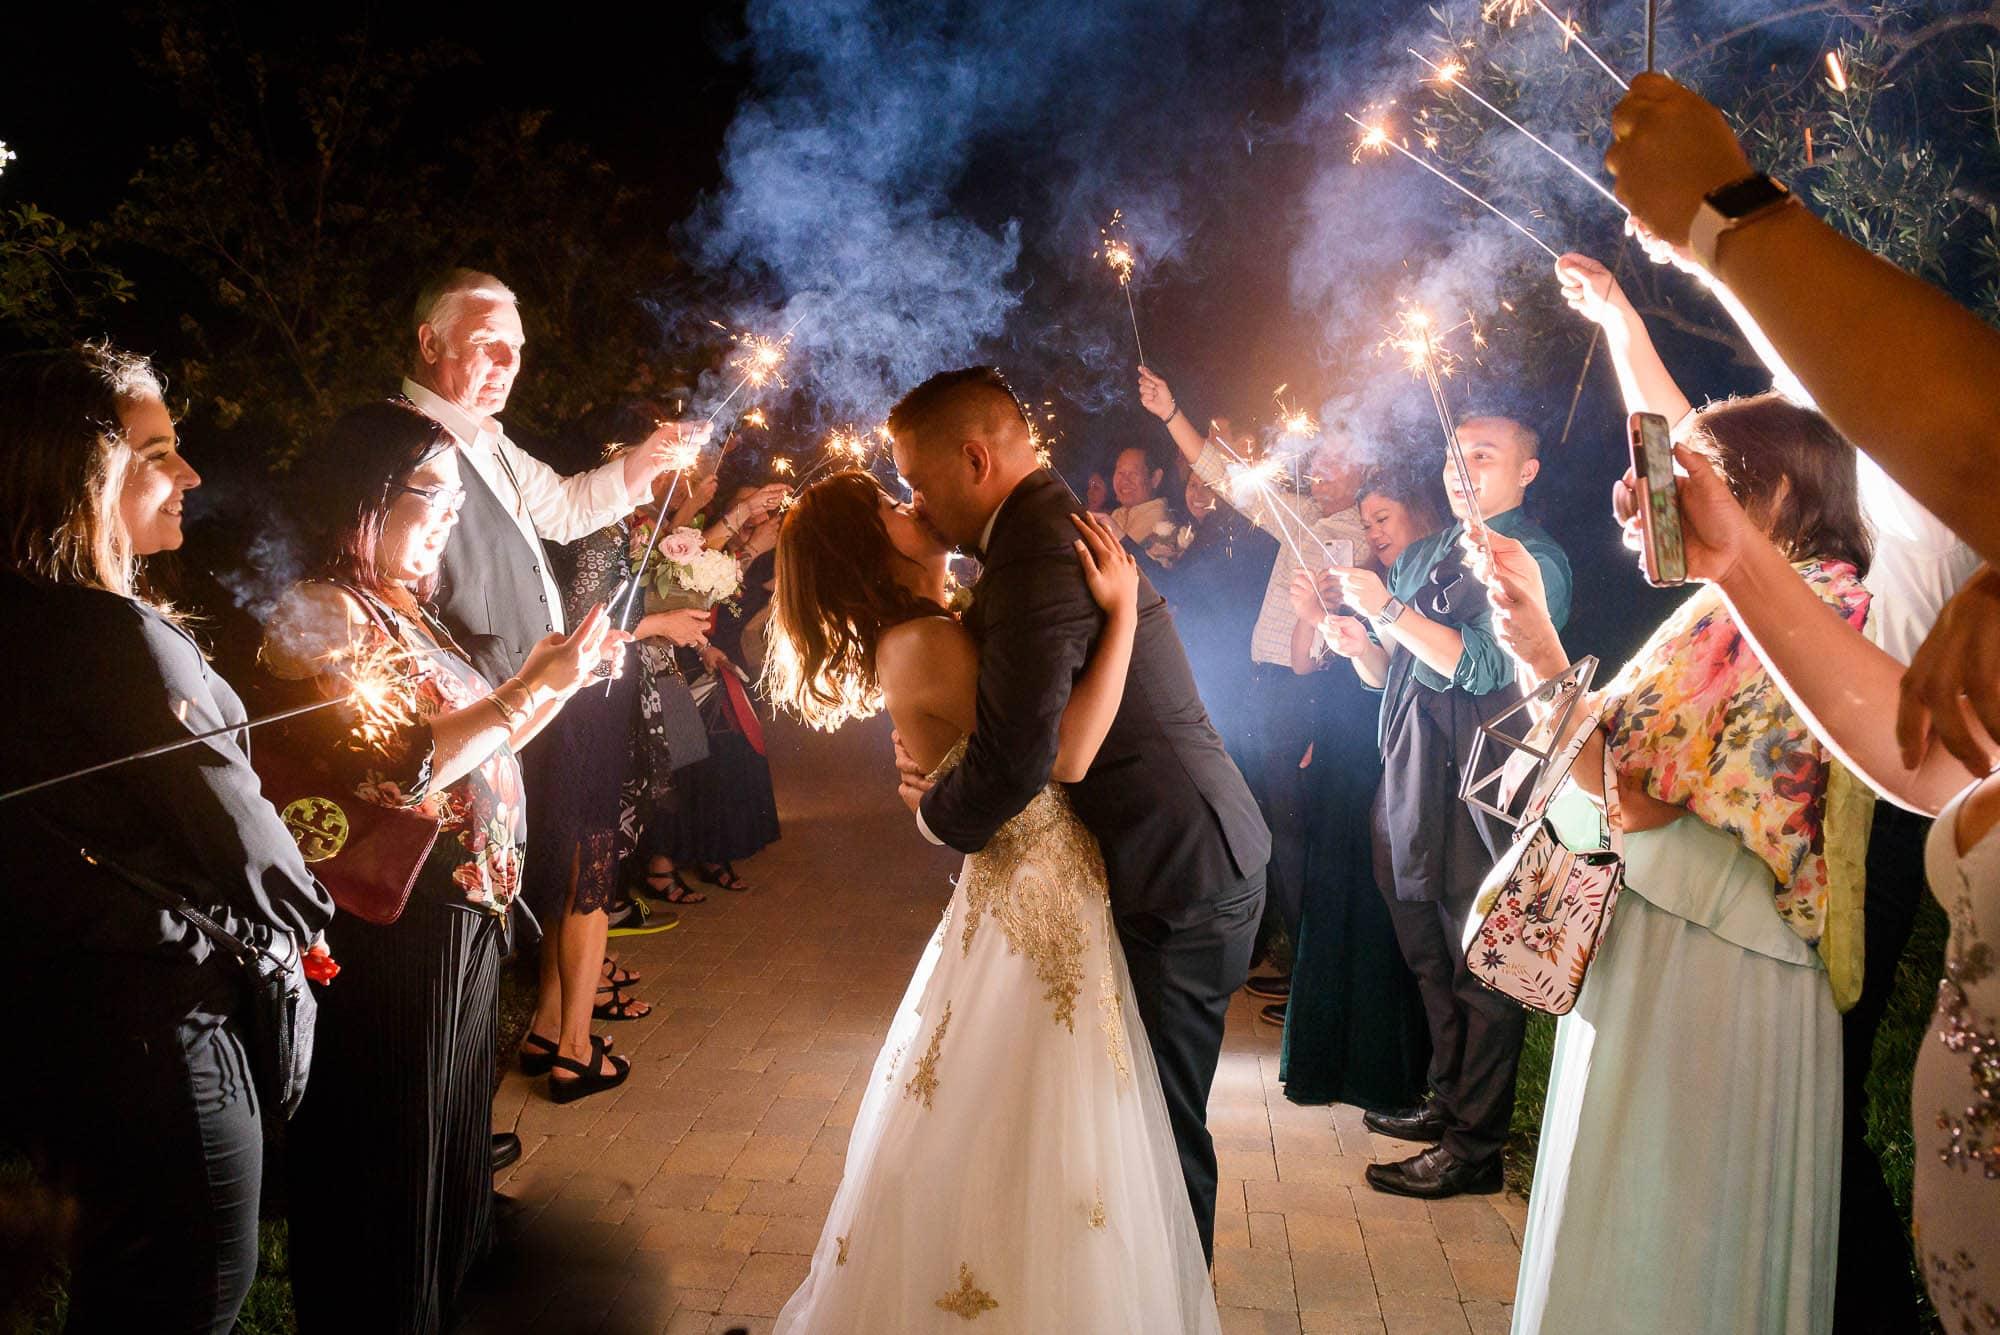 048_Alan_and_Heidi_Wedding_Karla_Paolo